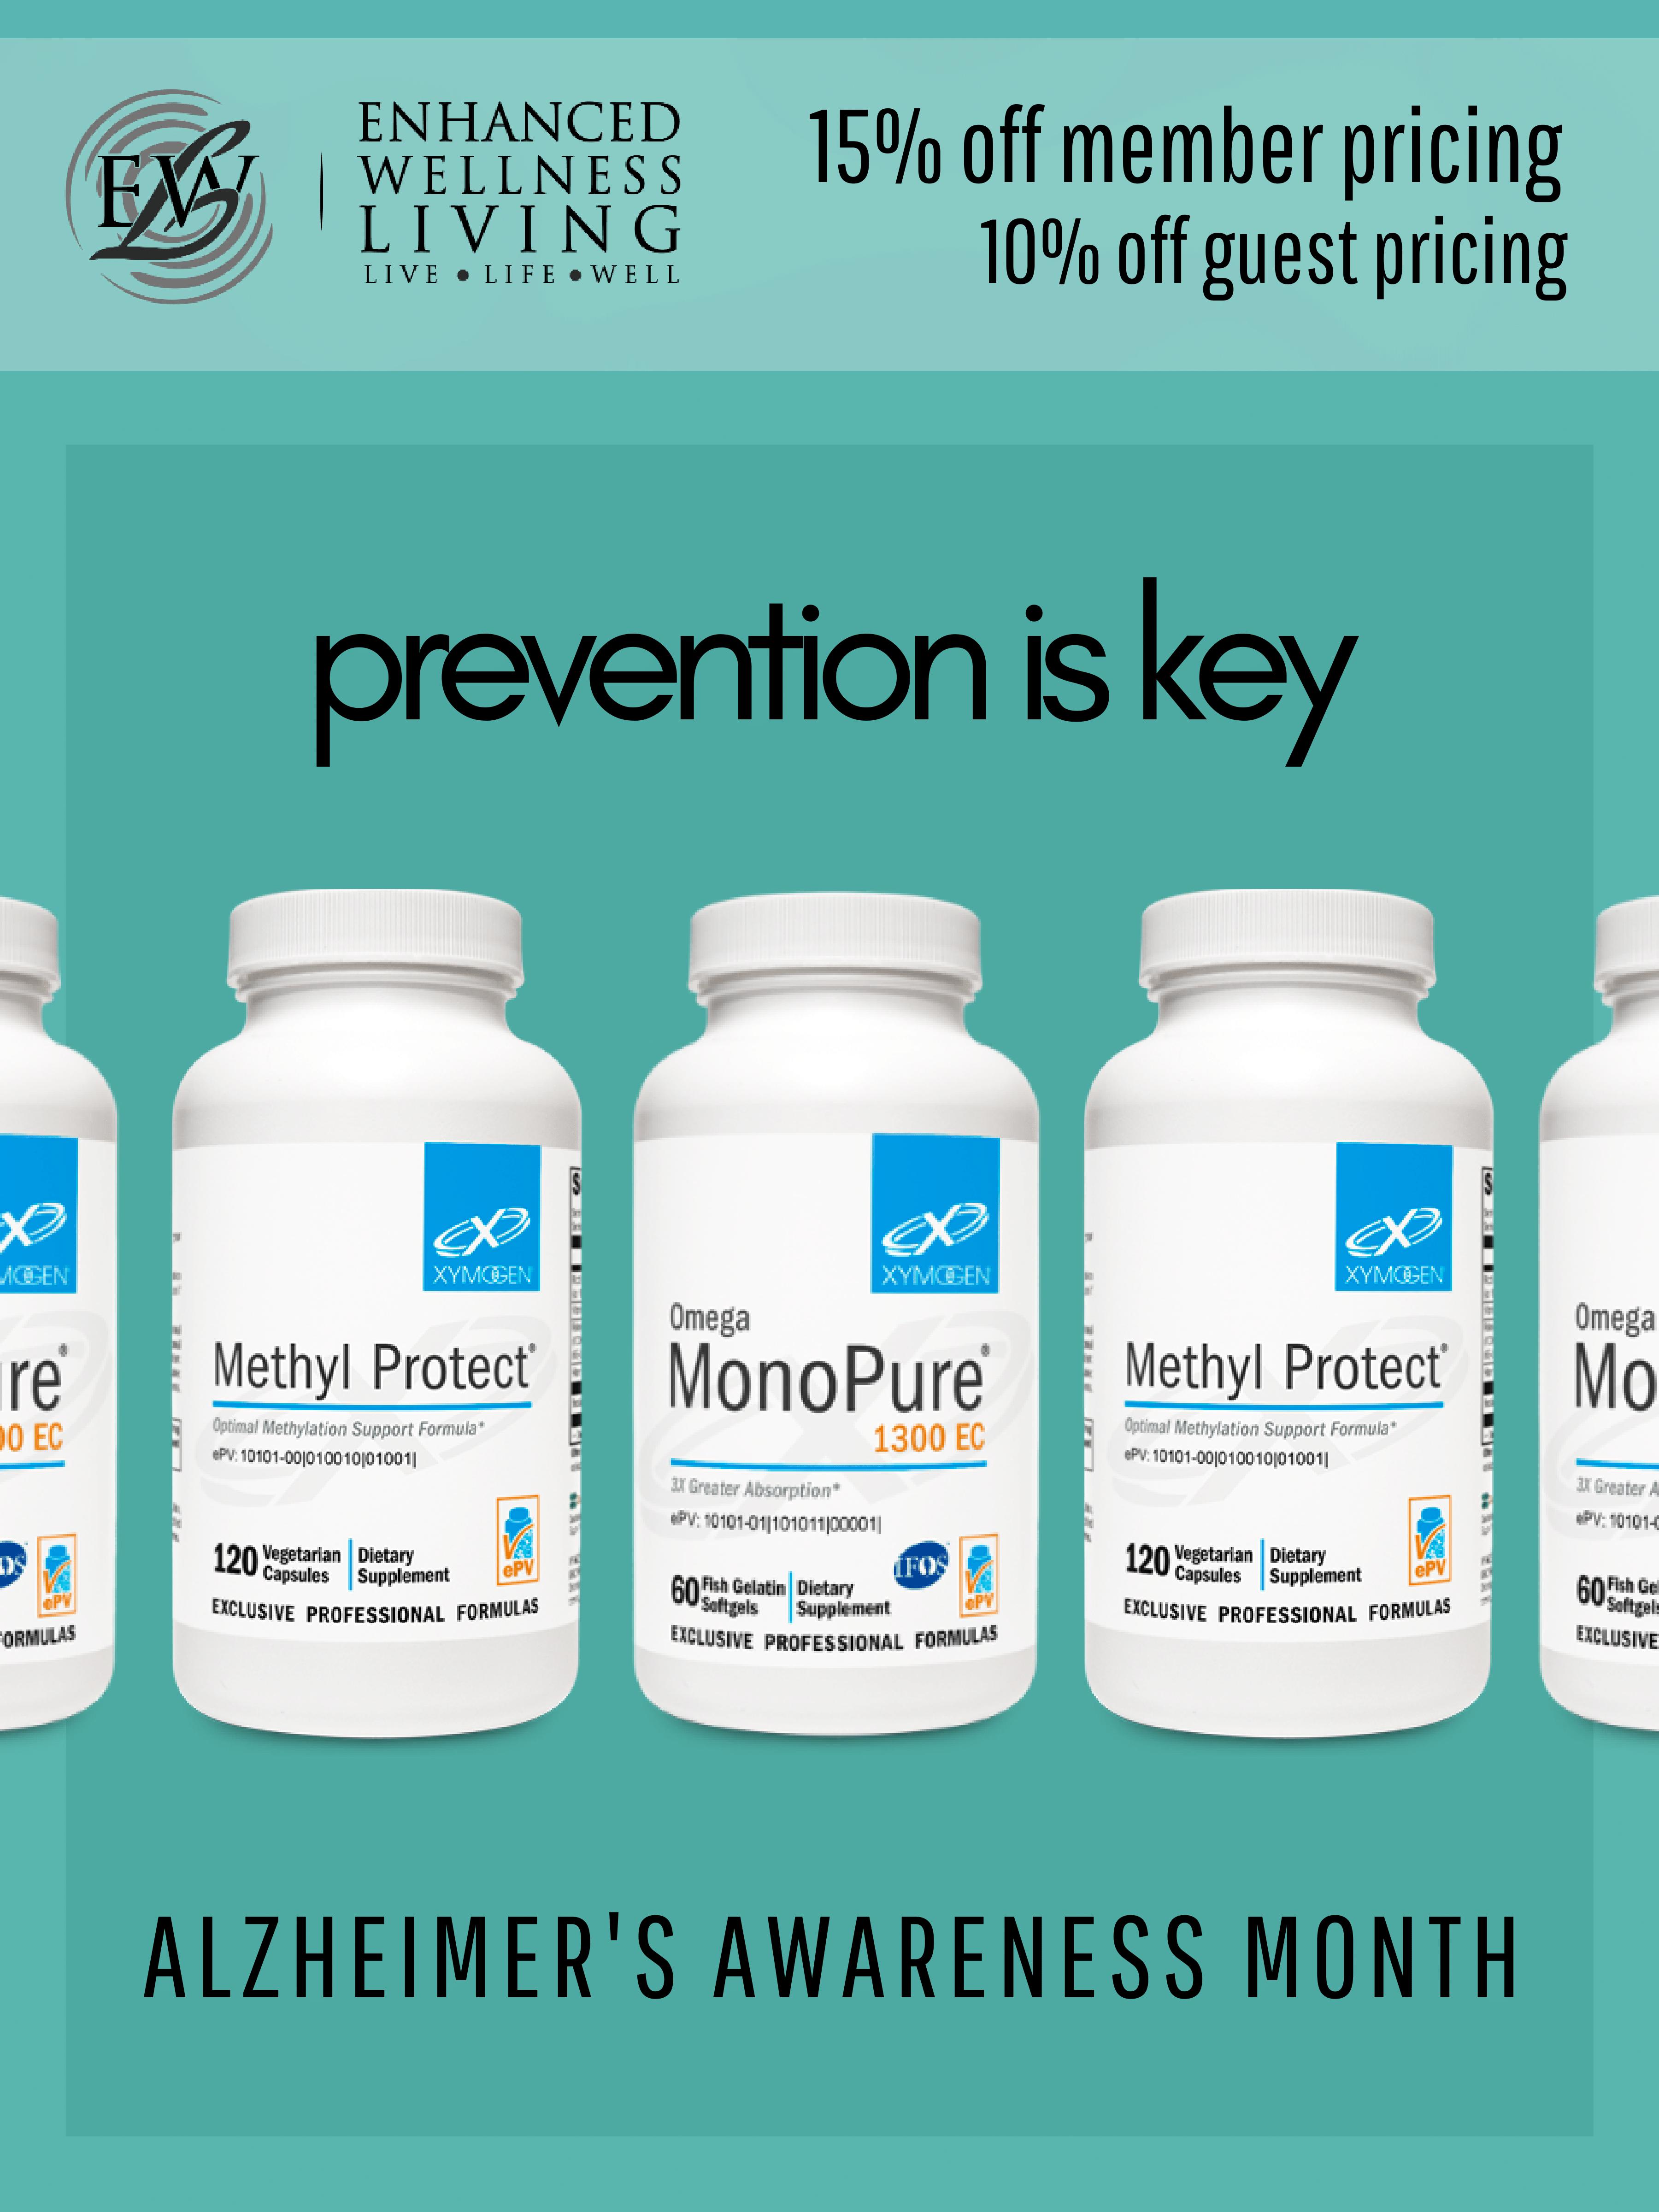 Enhanced Wellness Living